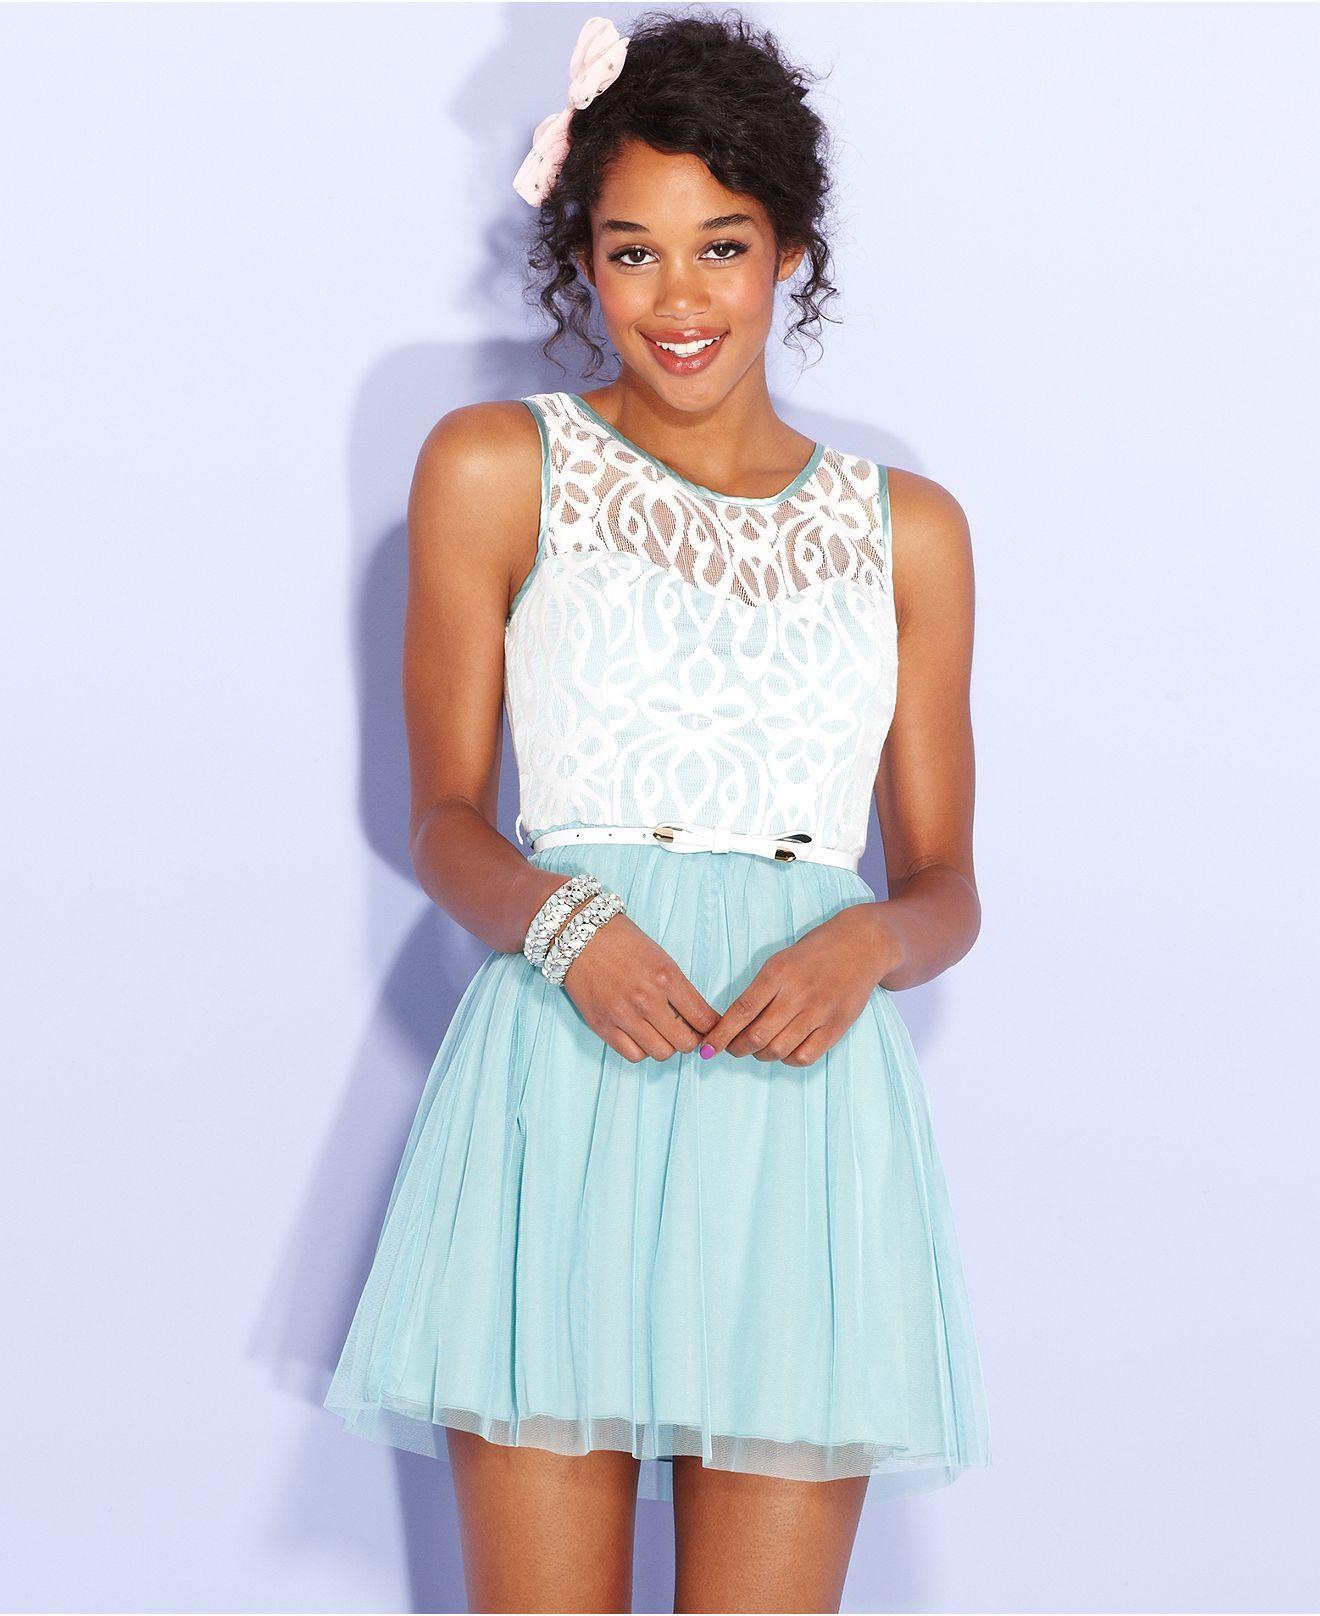 Alice cinderella bcx juniors dress sleeveless colorblock lace a